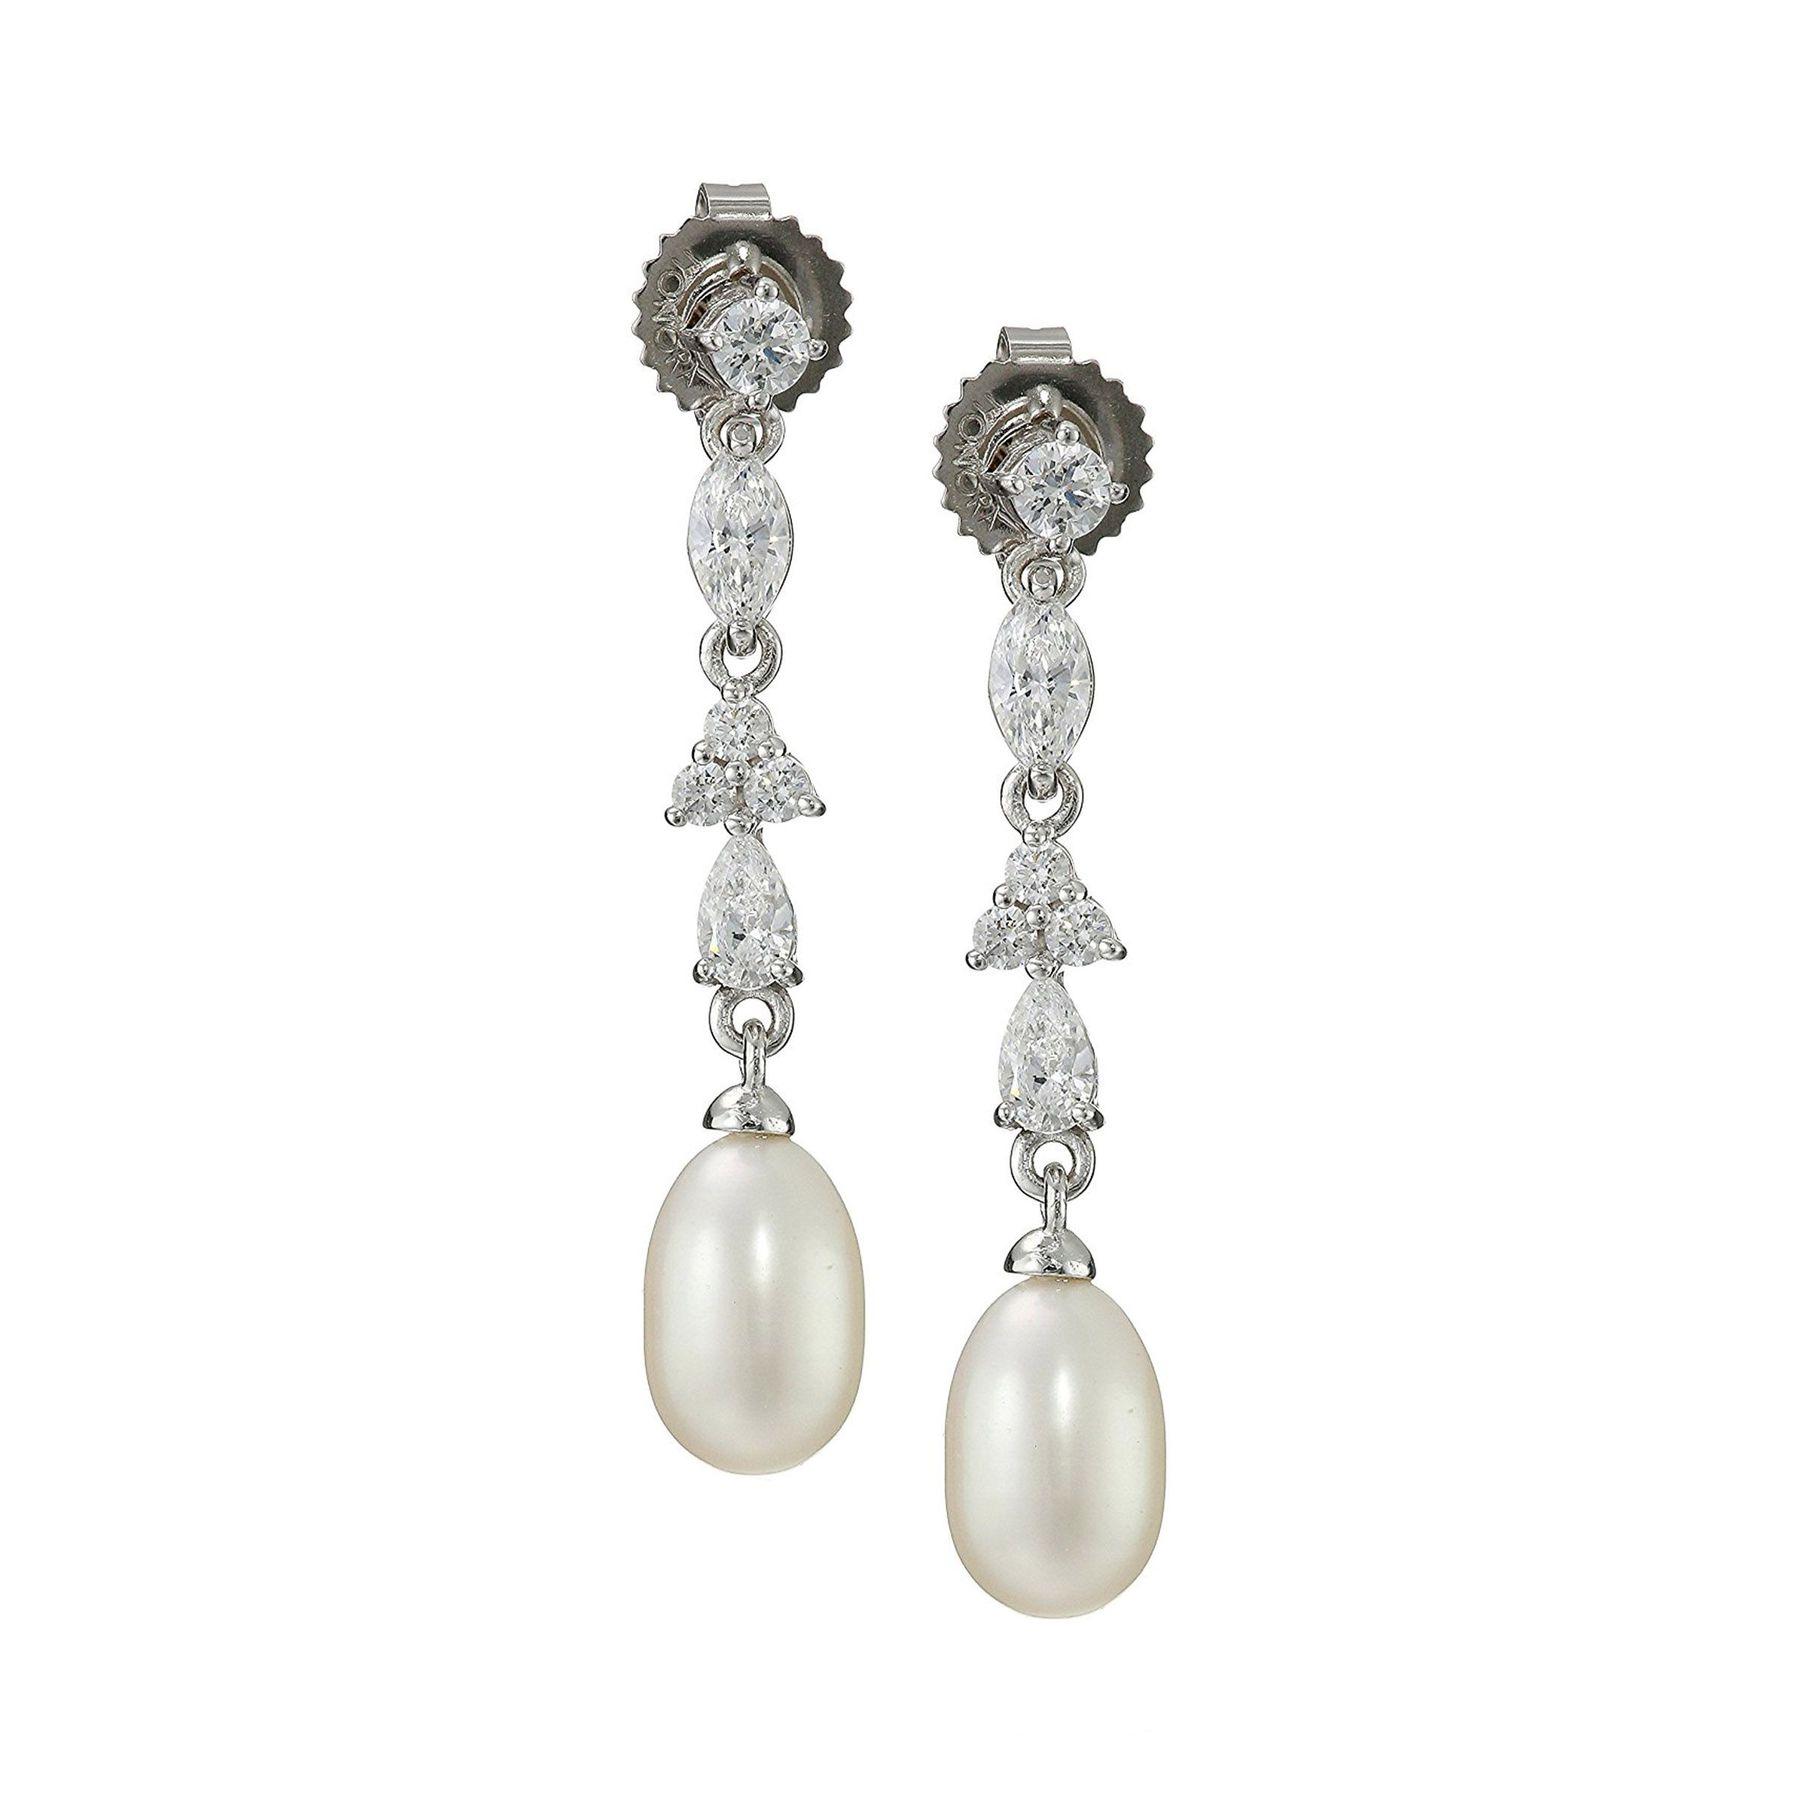 7 5 Mm Pearl Drop Earrings With Swarovski Zirconia